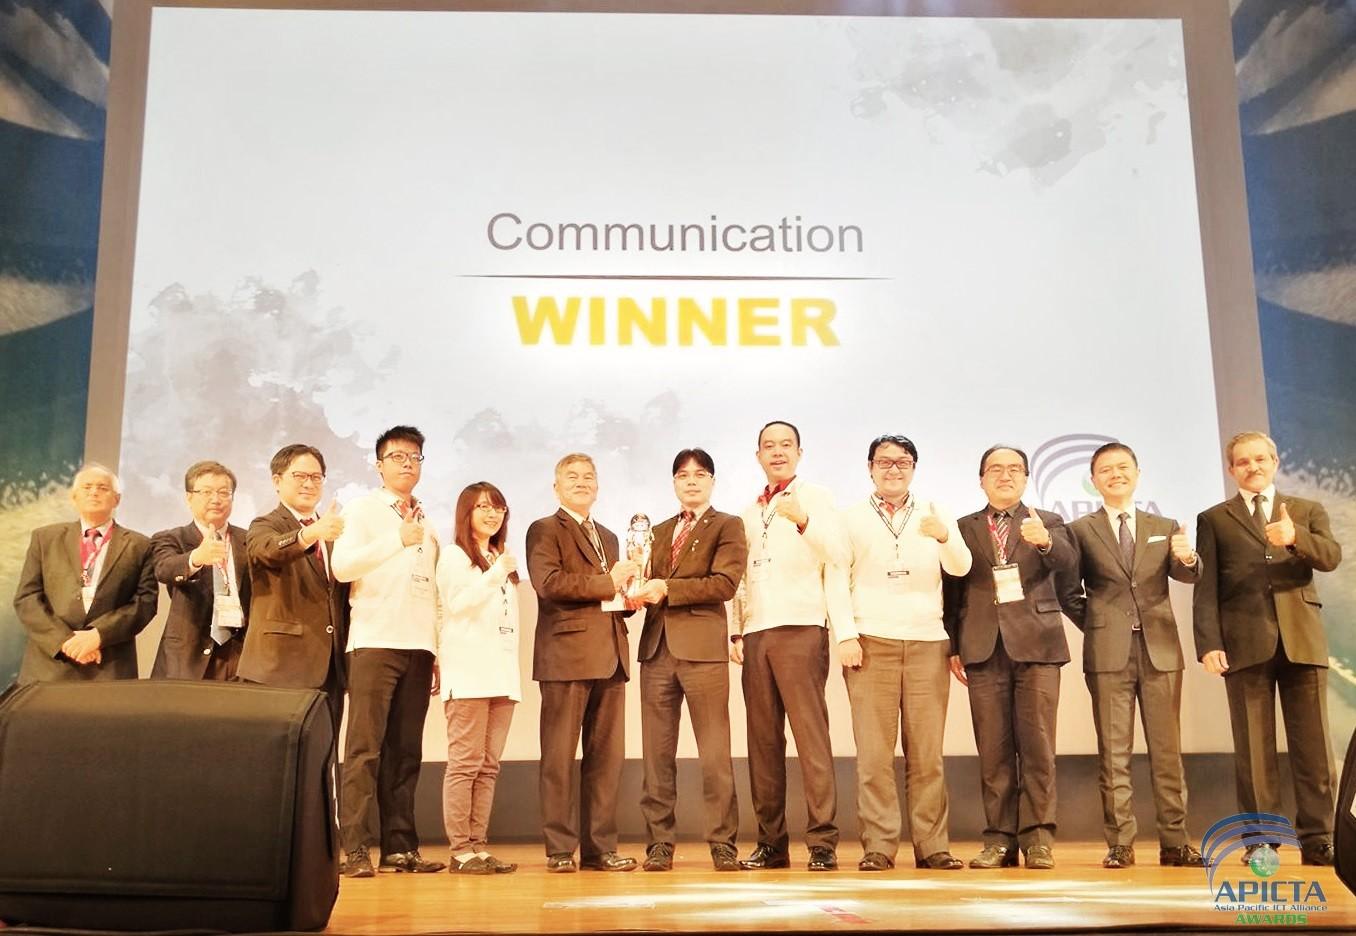 team》代表台灣,奪下APICTA-Awards通訊類金牌獎